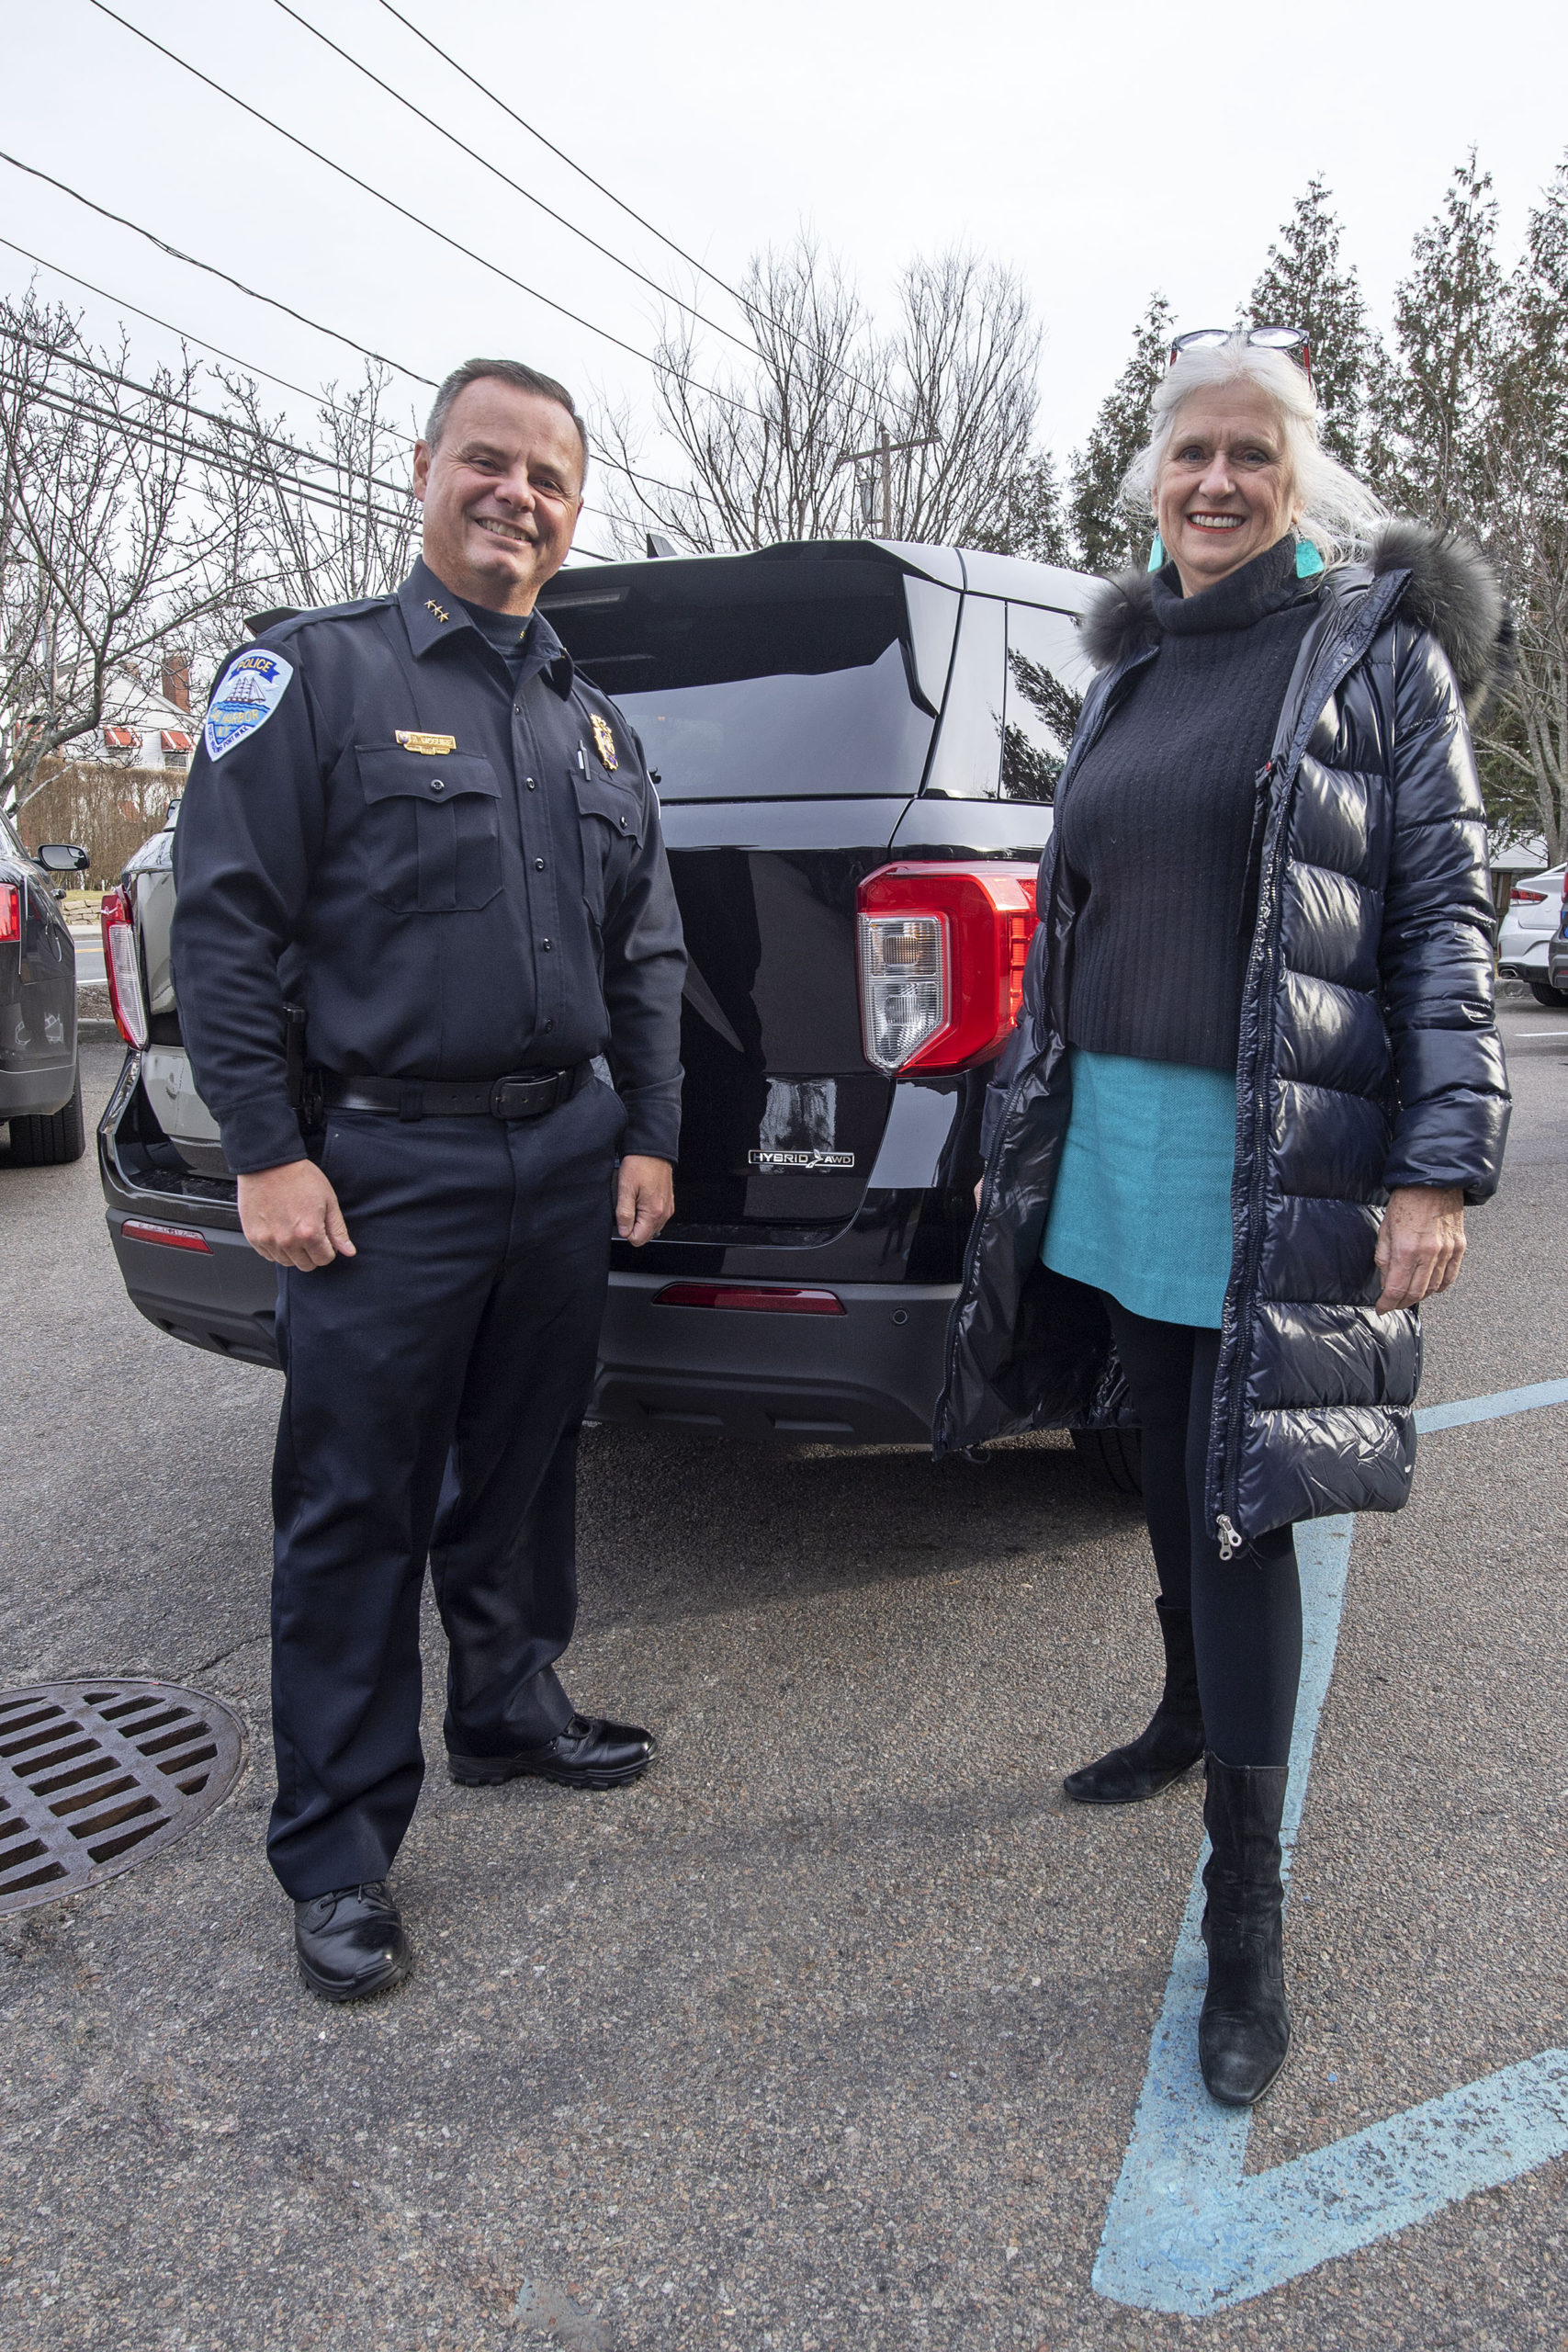 Sag Harbor Village Mayor Kathleen Mulcahy and Sag Harbor Village Police Chief Austin J. McGuire with the village's first hybrid SUV.